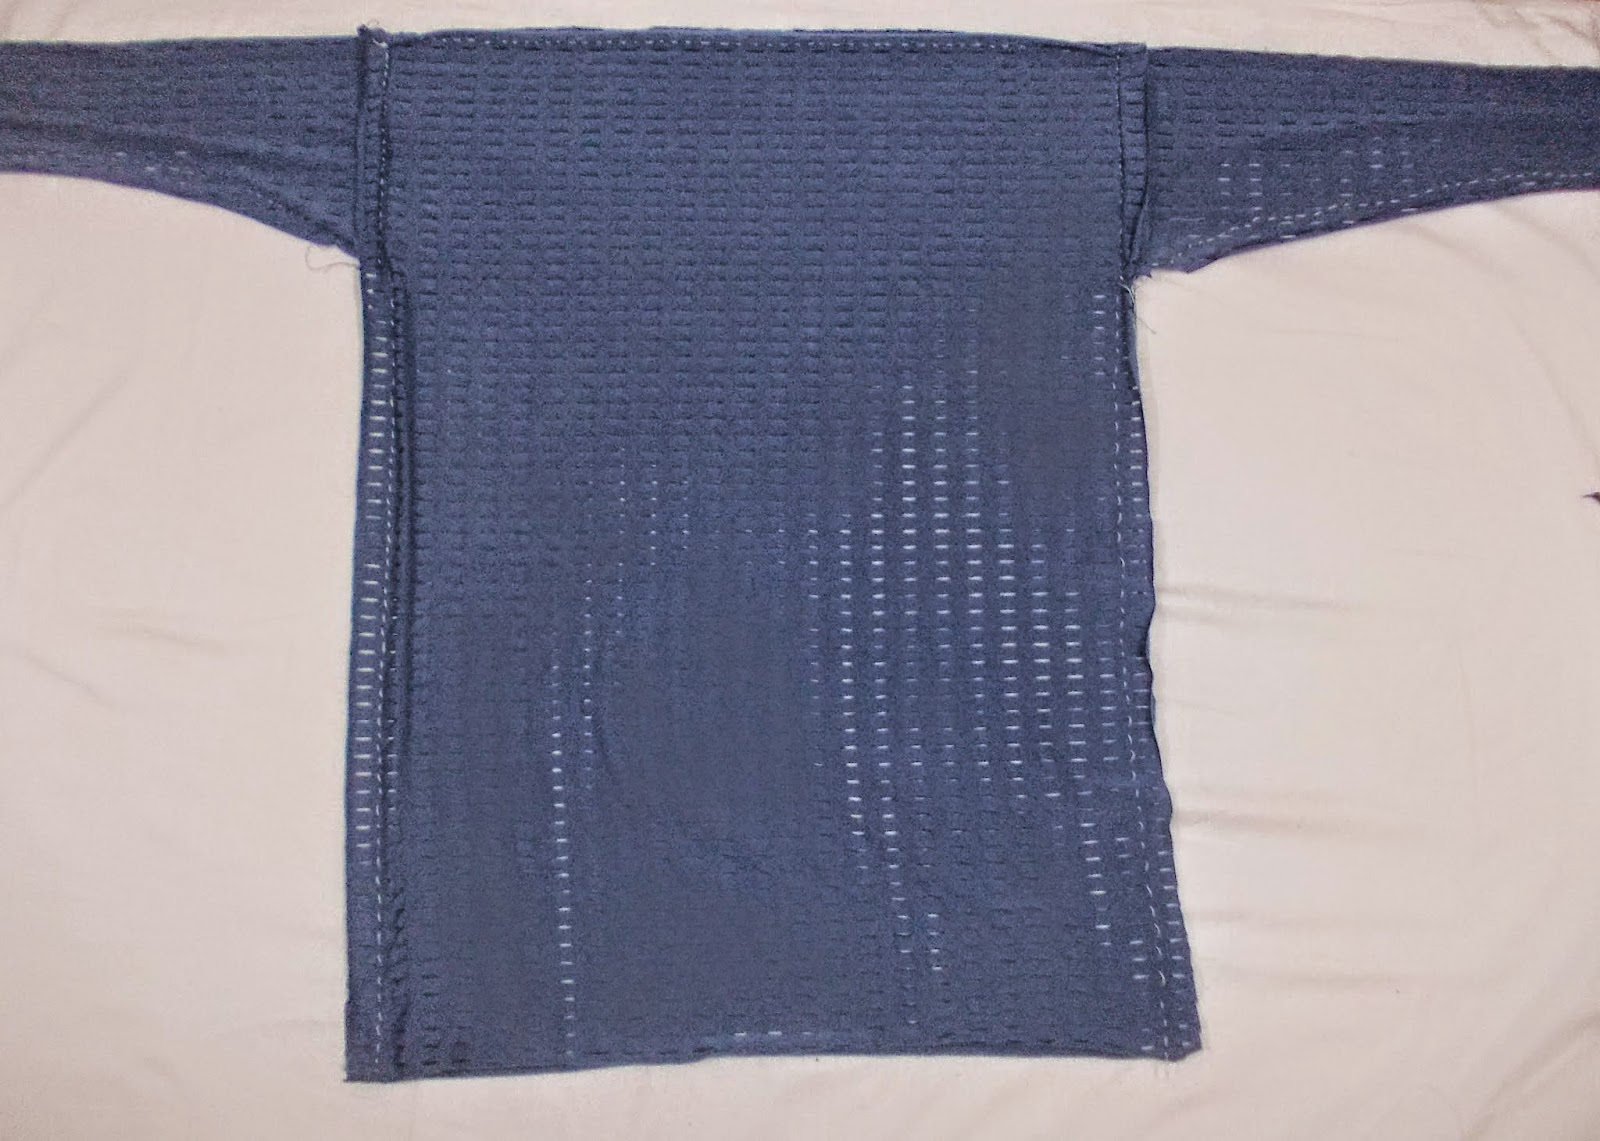 Kalıpsız pratik bluz dikimi